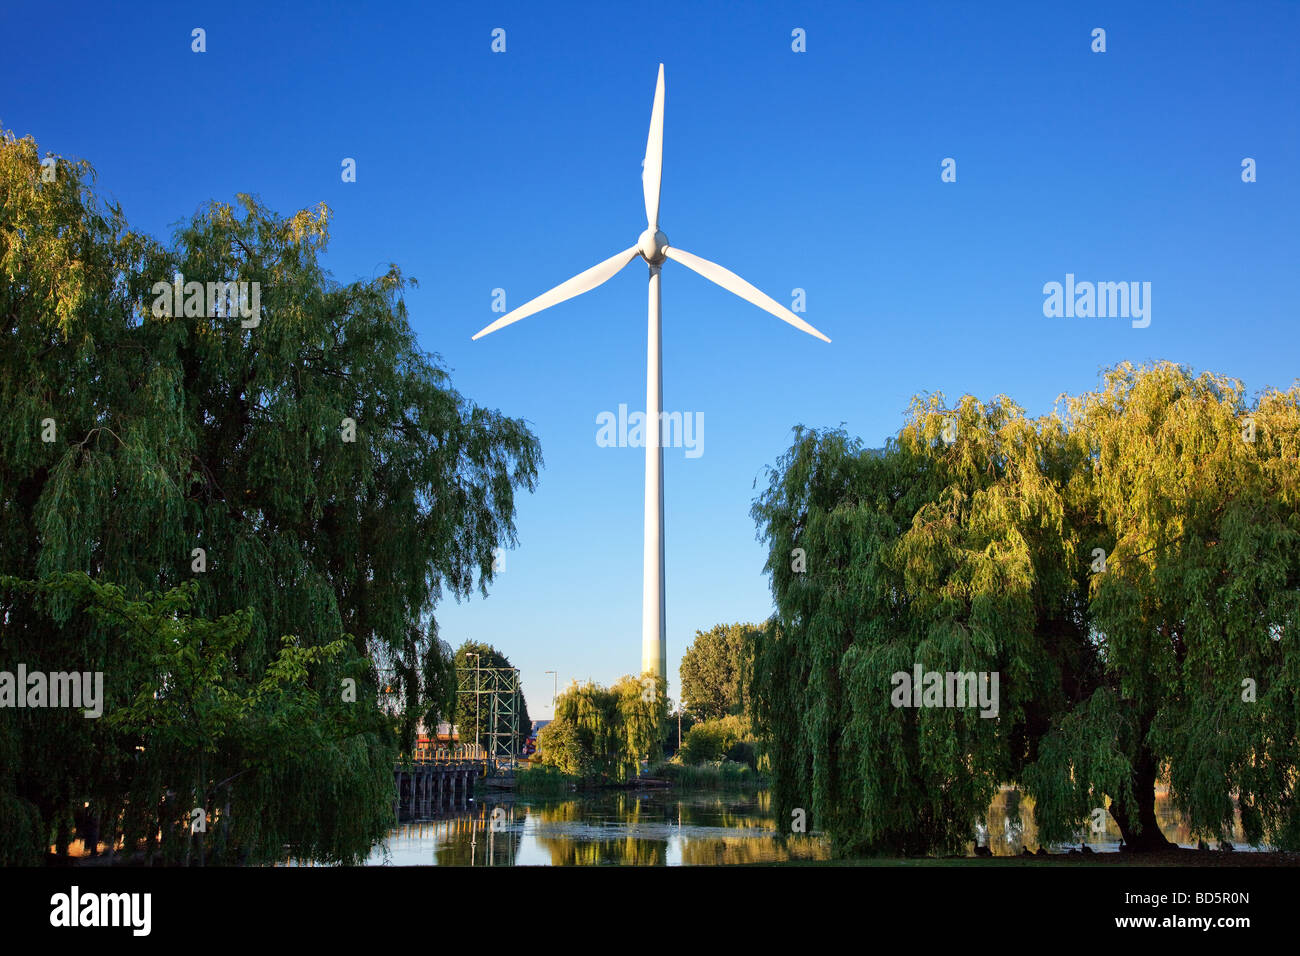 Wind Turbine At Ford Dagenham Plant Stock Photo Alamy